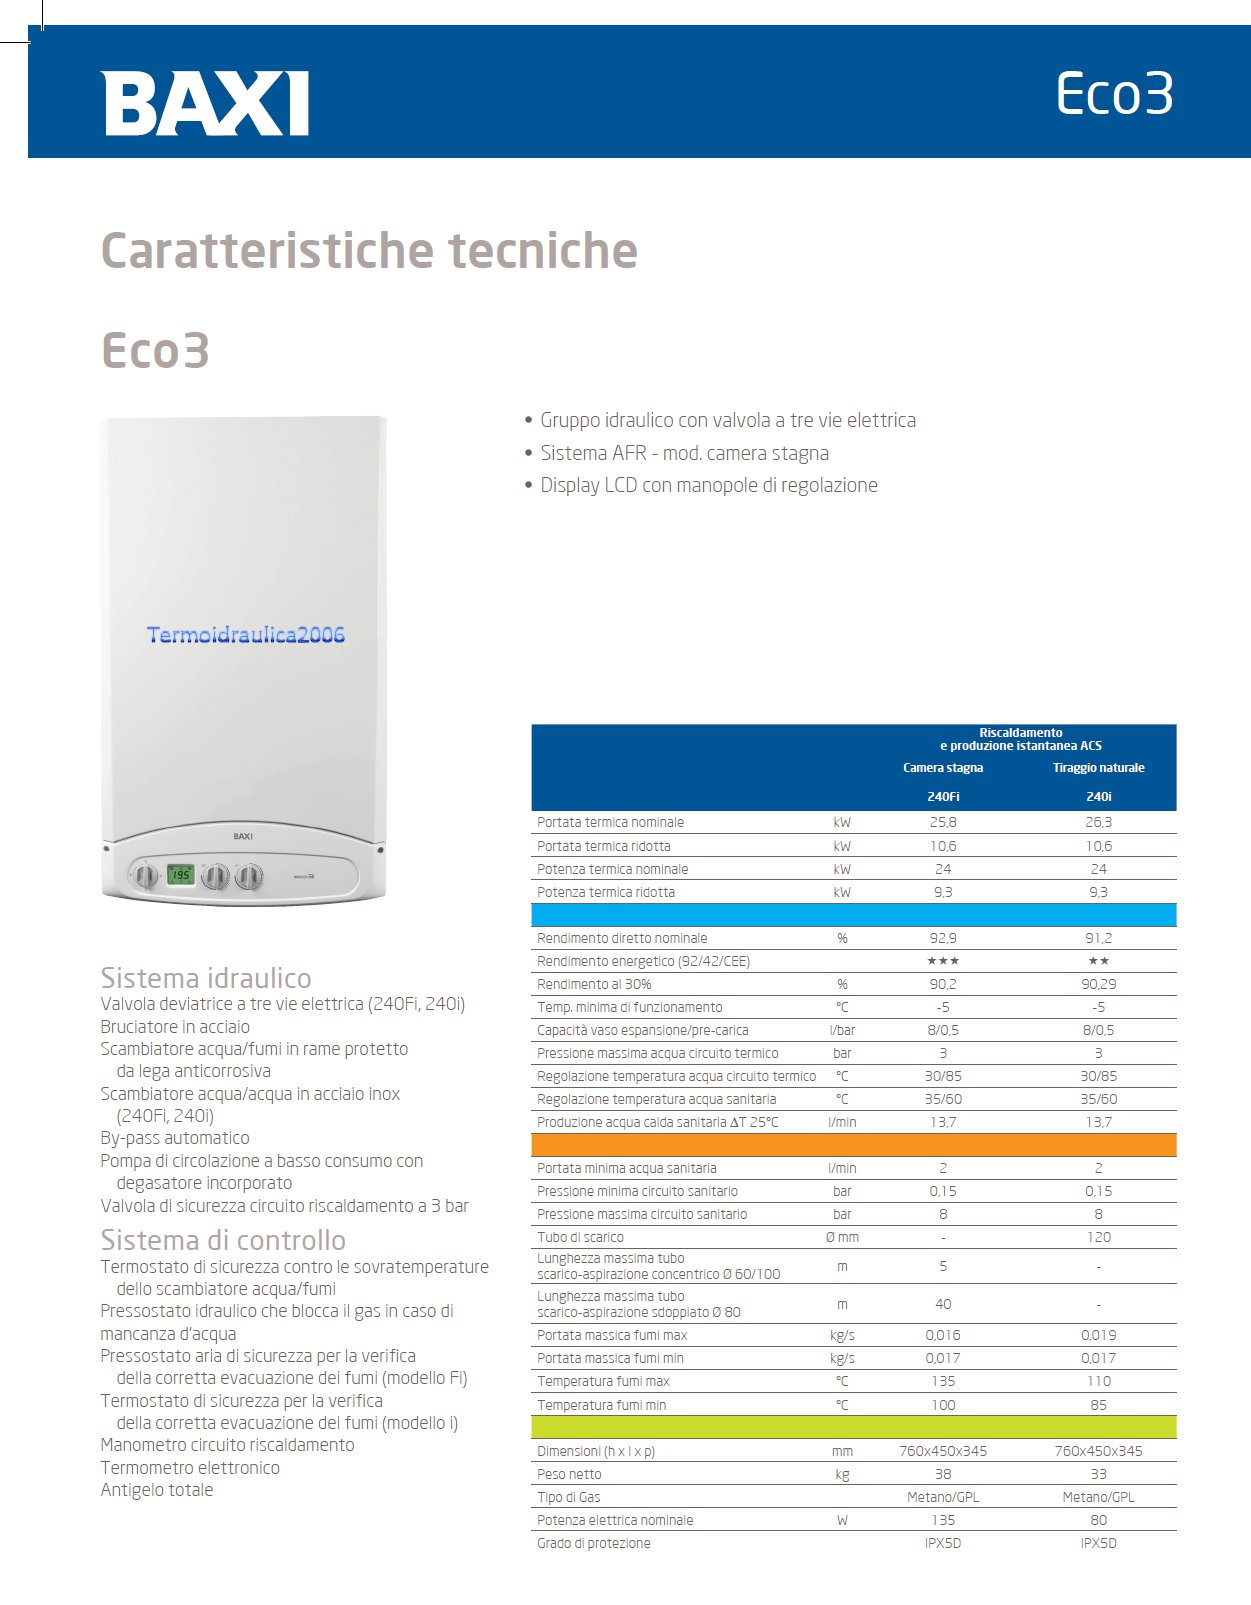 Baxi eco3 csb45624168 classic combi boiler heating 240fi for Baxi eco 3 manuale